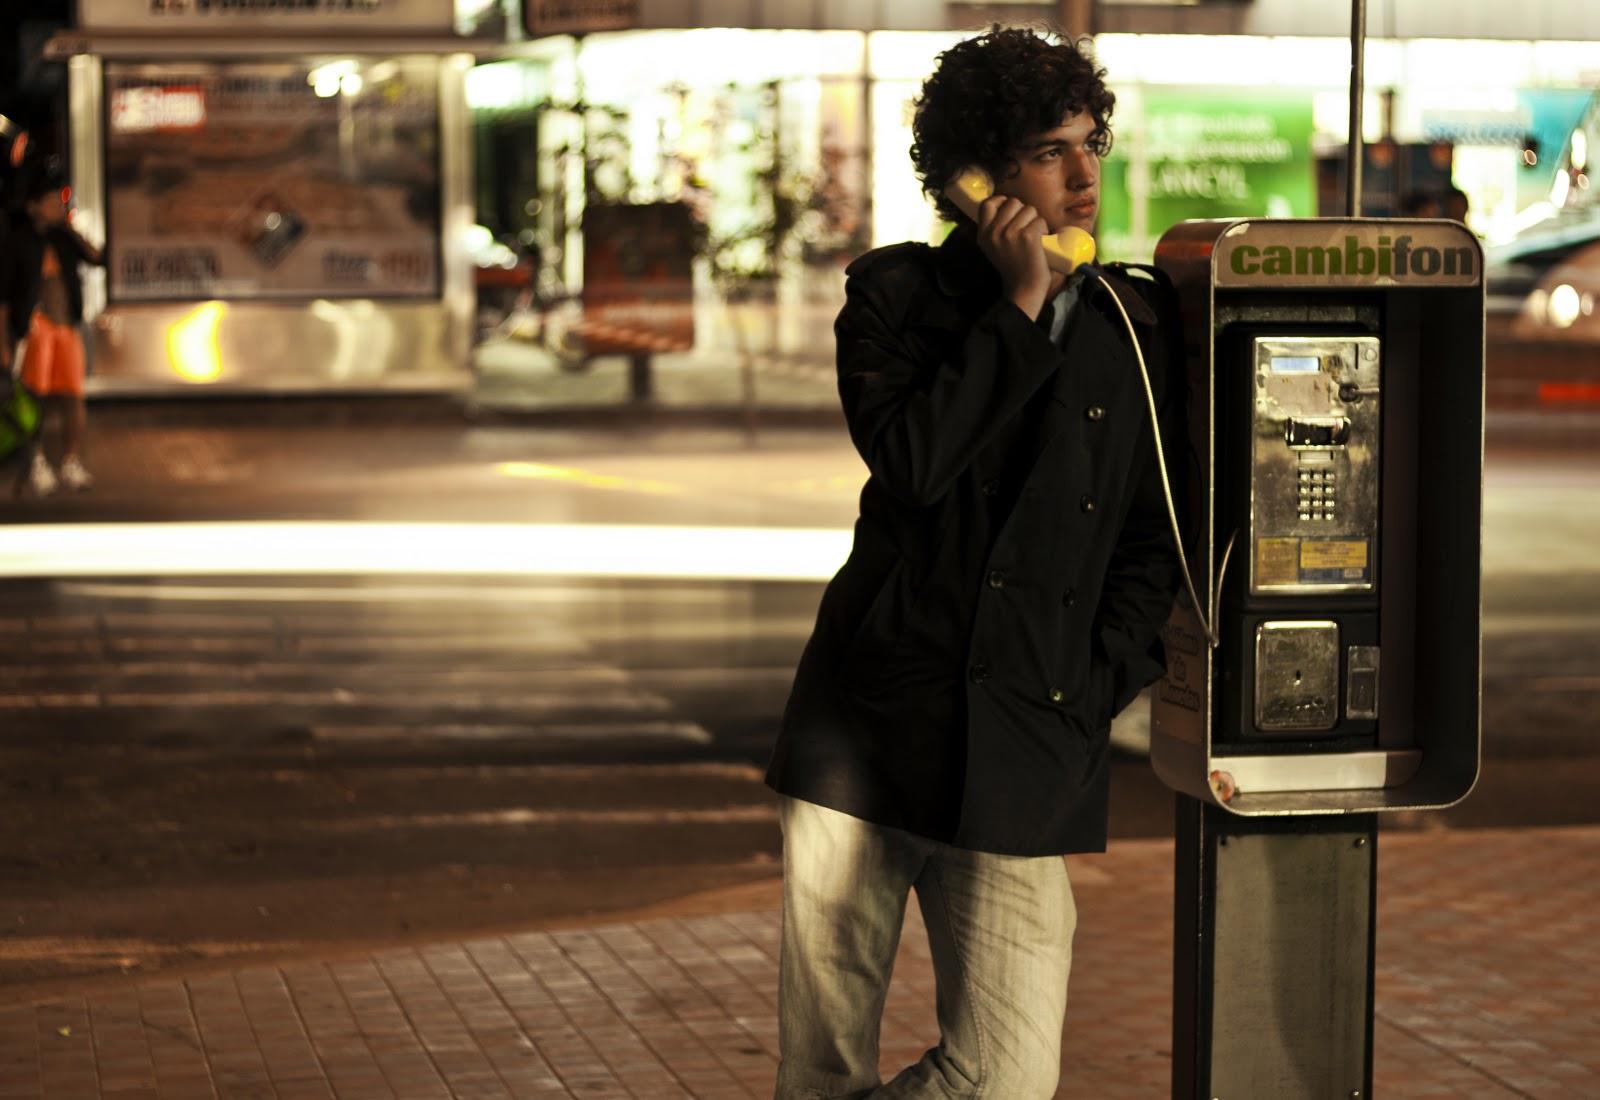 Quitar ruido fotografia nocturna 94